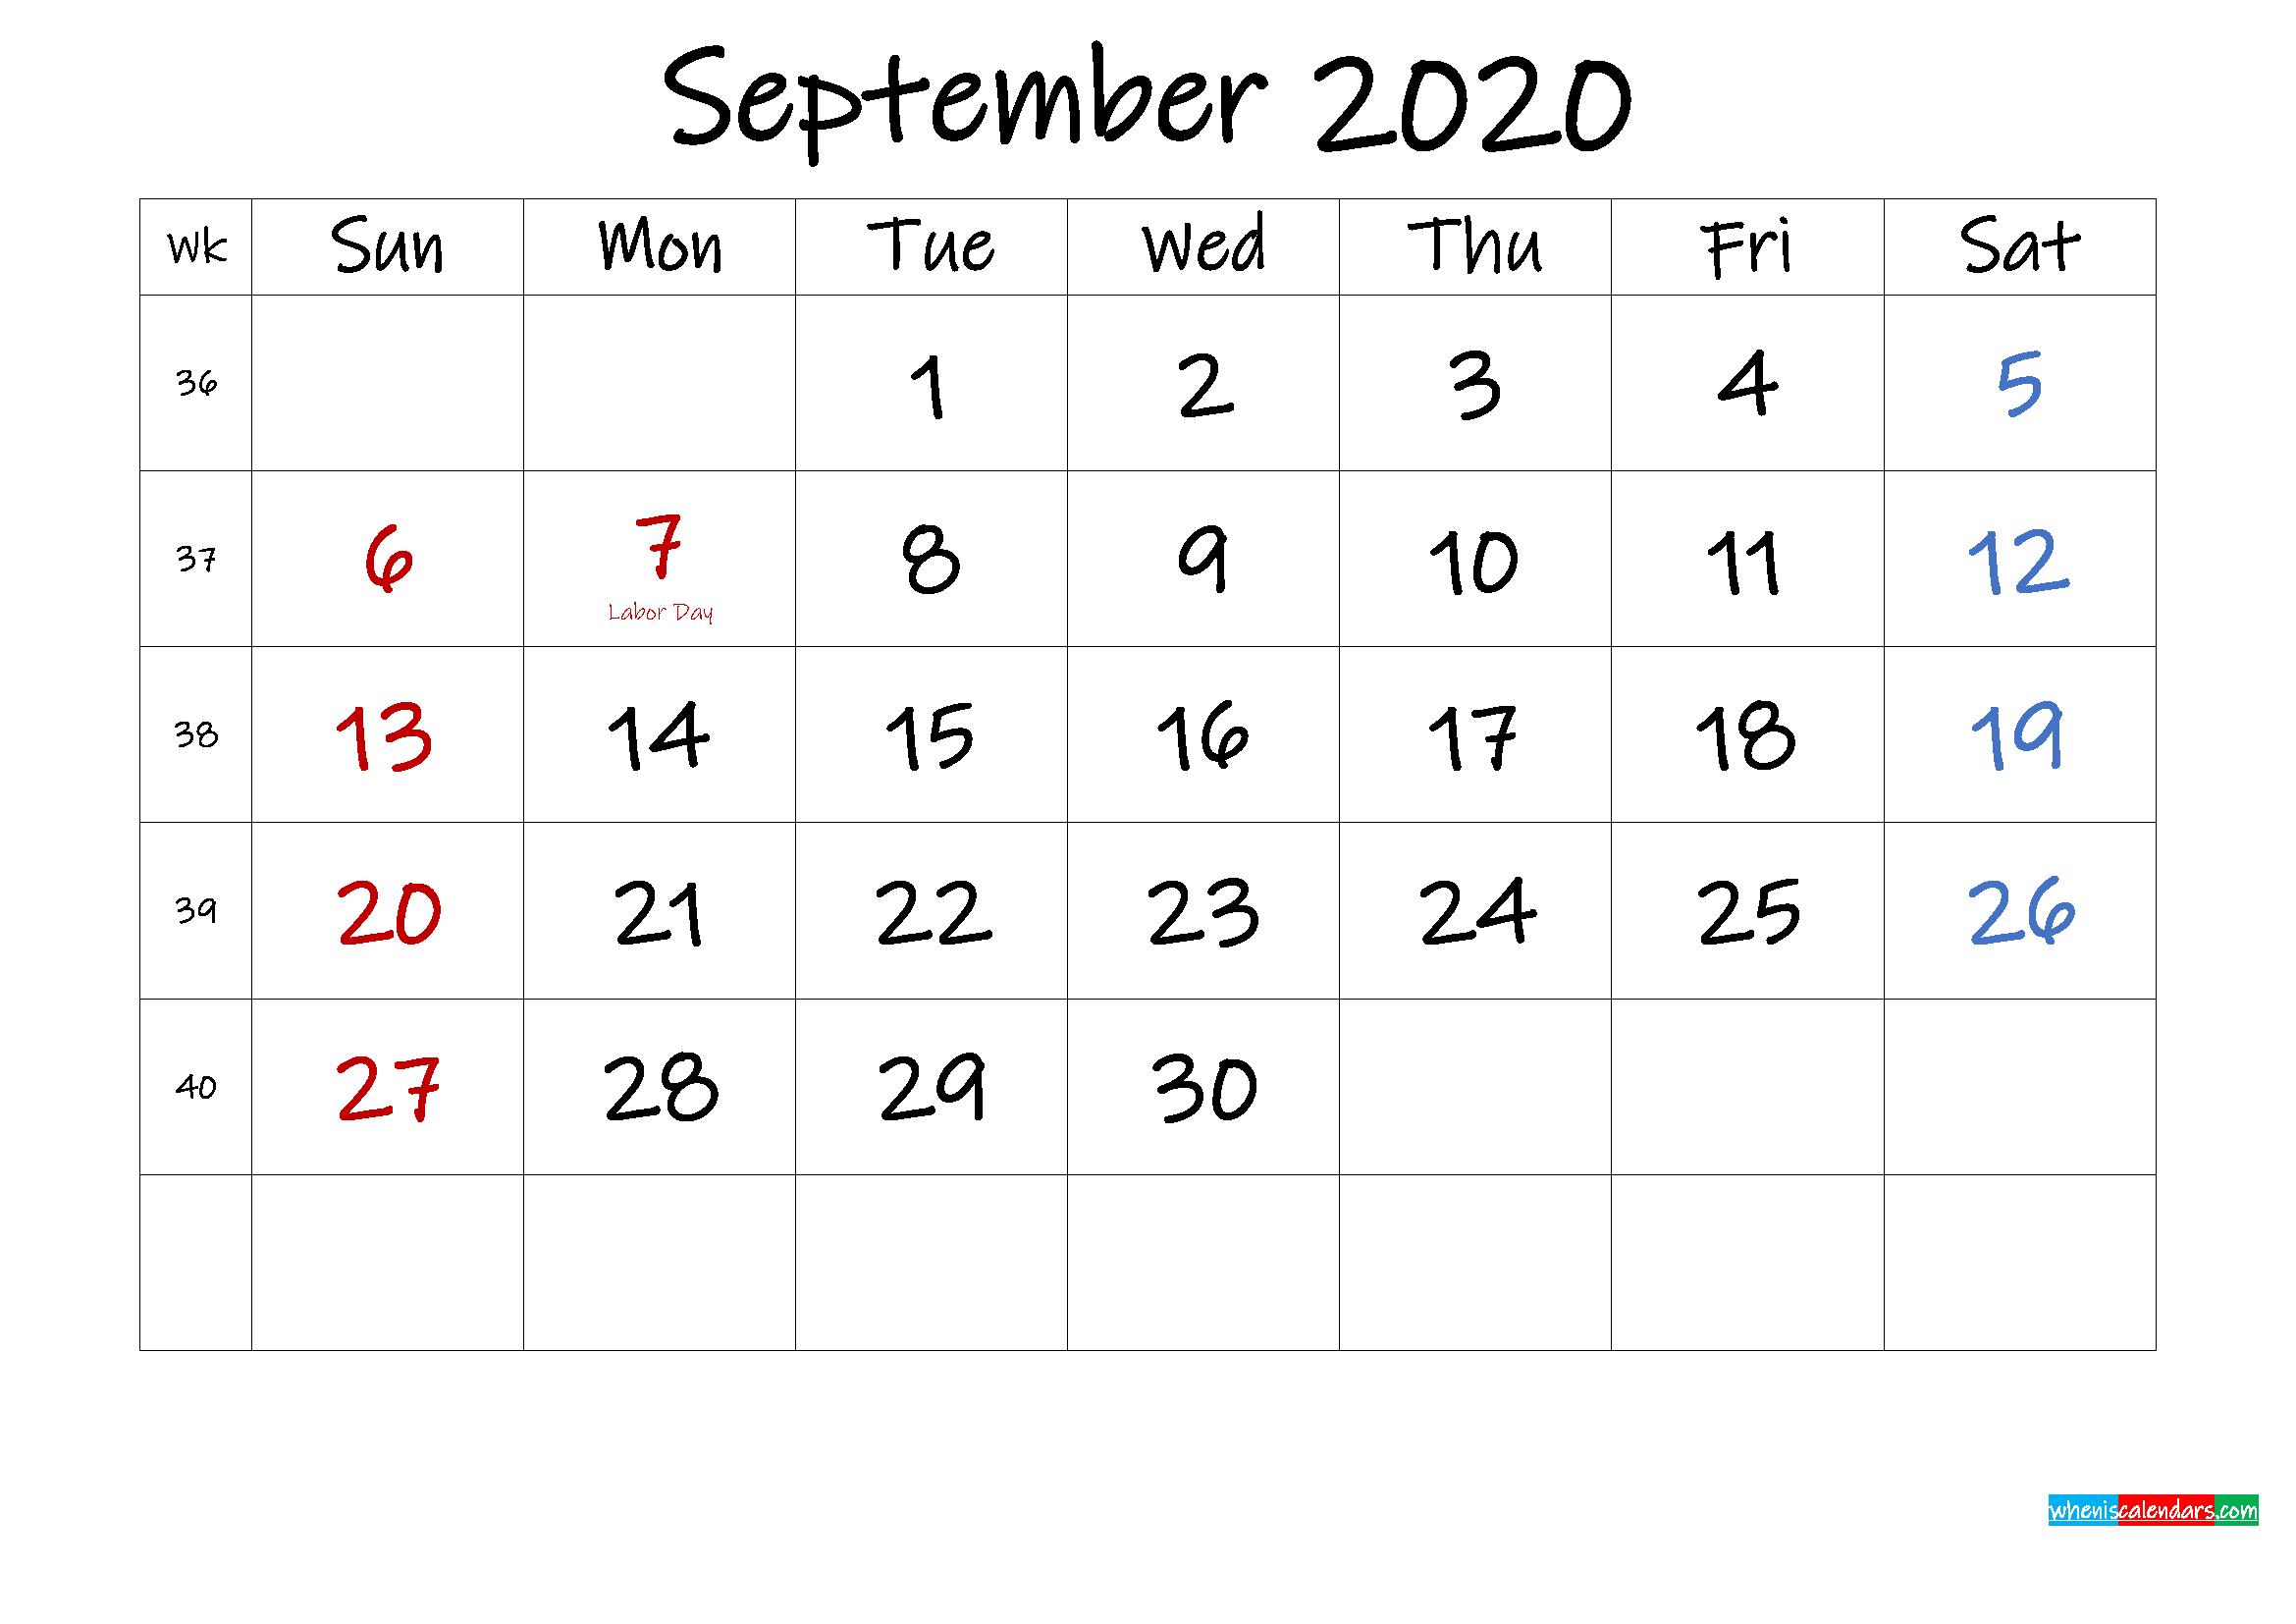 September 2020 Free Printable Calendar with Holidays